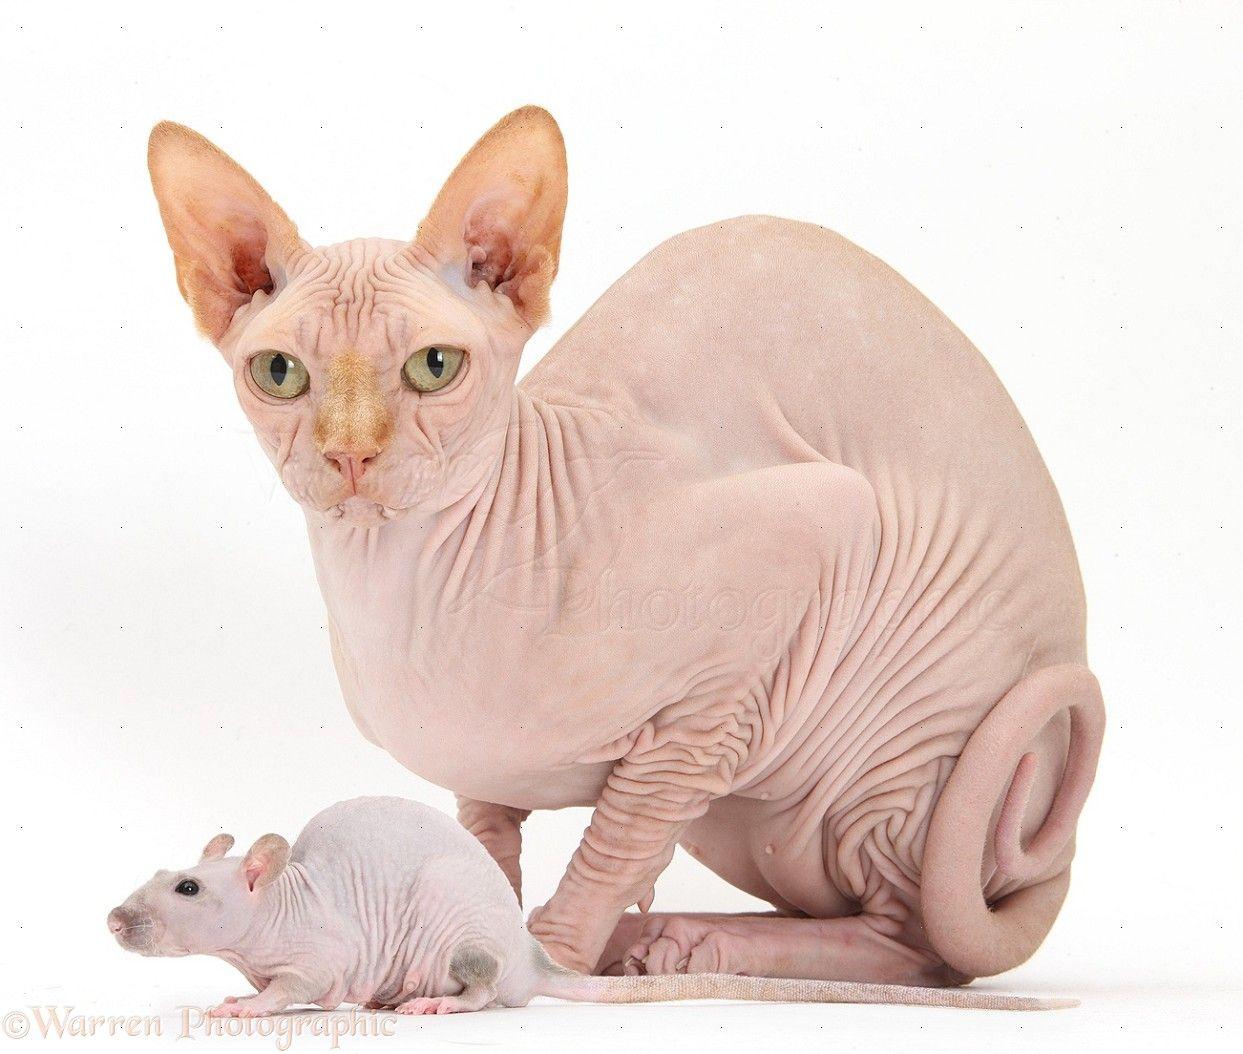 40153 Sphynx Cat And Sphynx Rat White Background Jpg 1 243 1 054 Pixels Cat Behavior Animals Pets